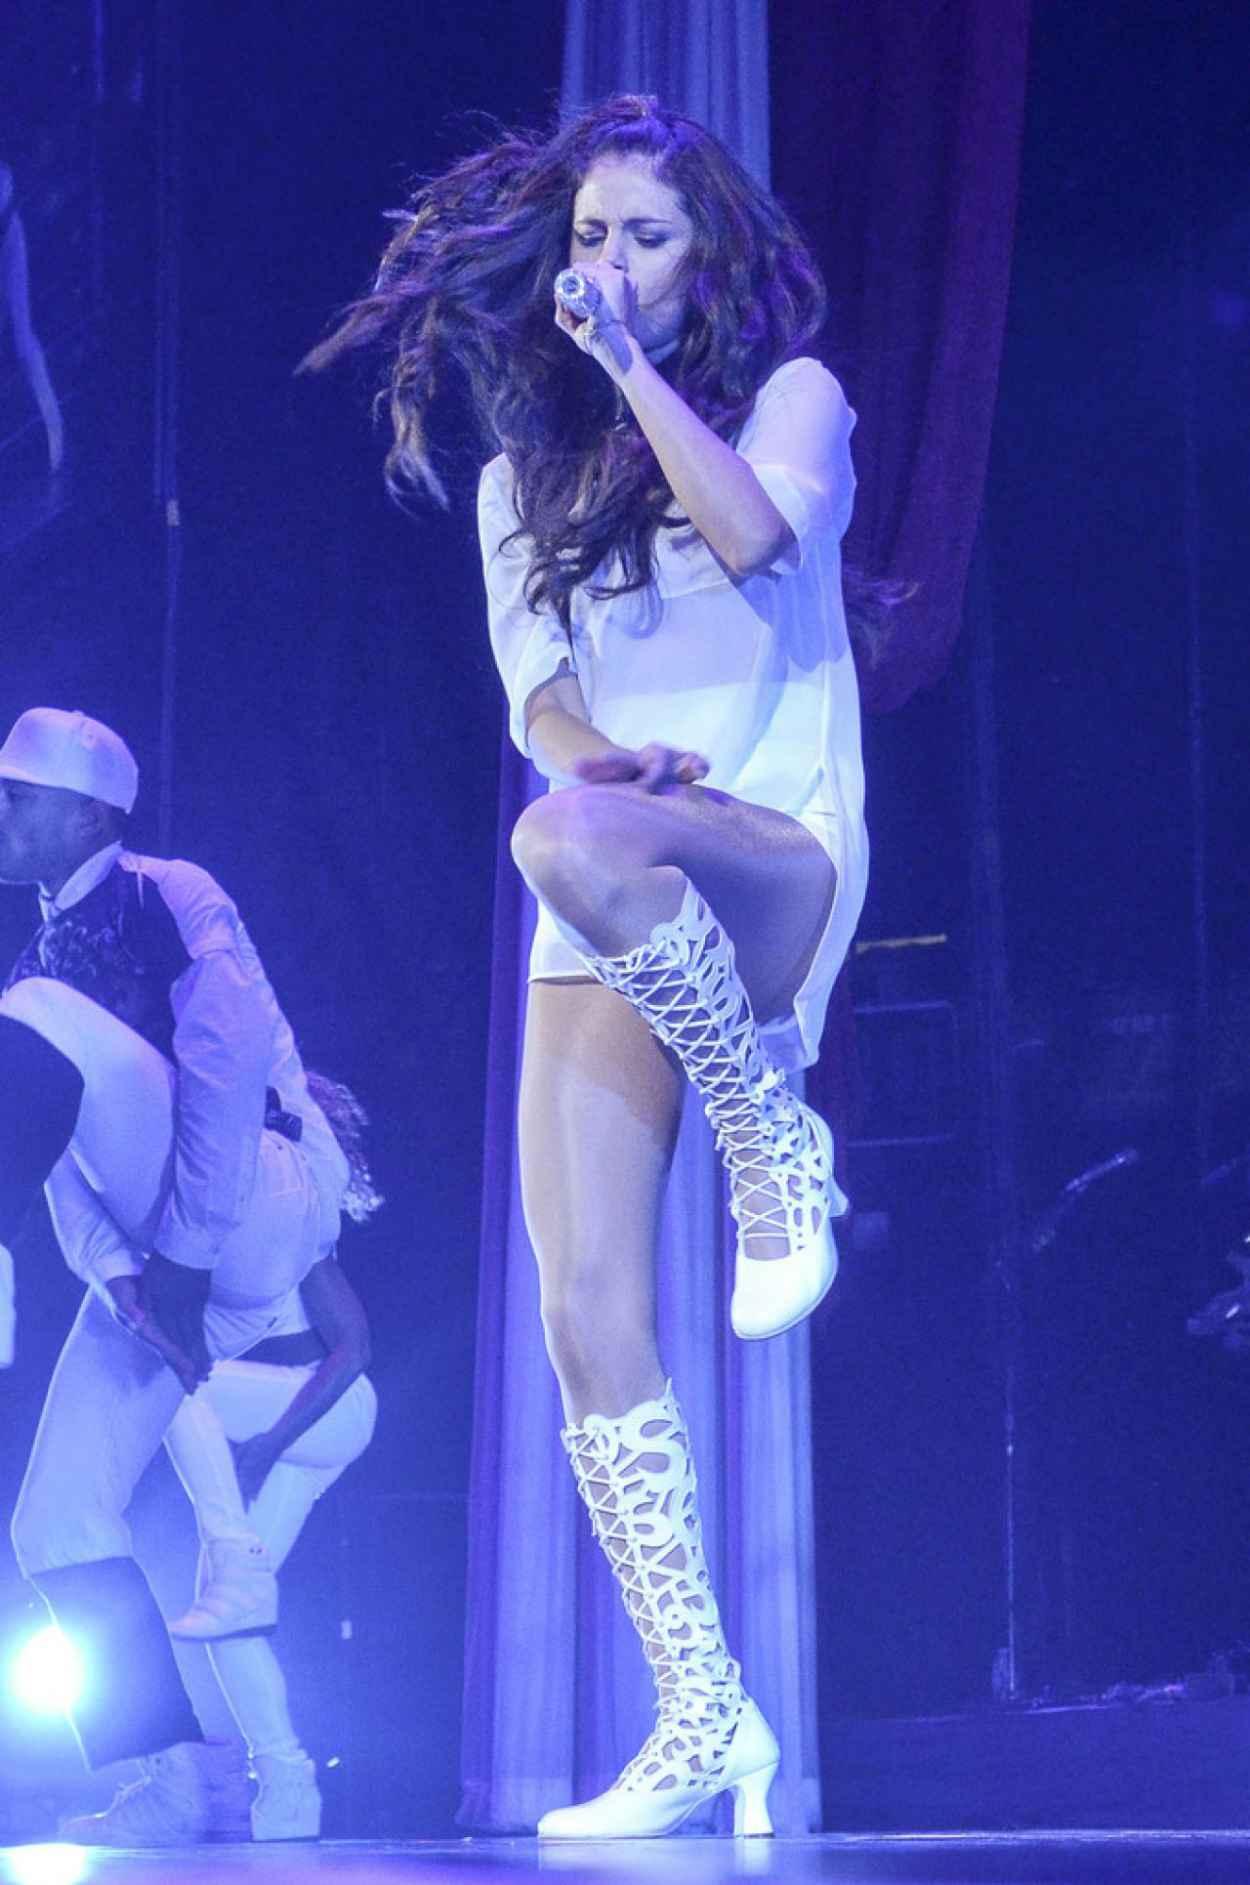 Selena Gomez Washington Concert Pics - Stars Dance-1